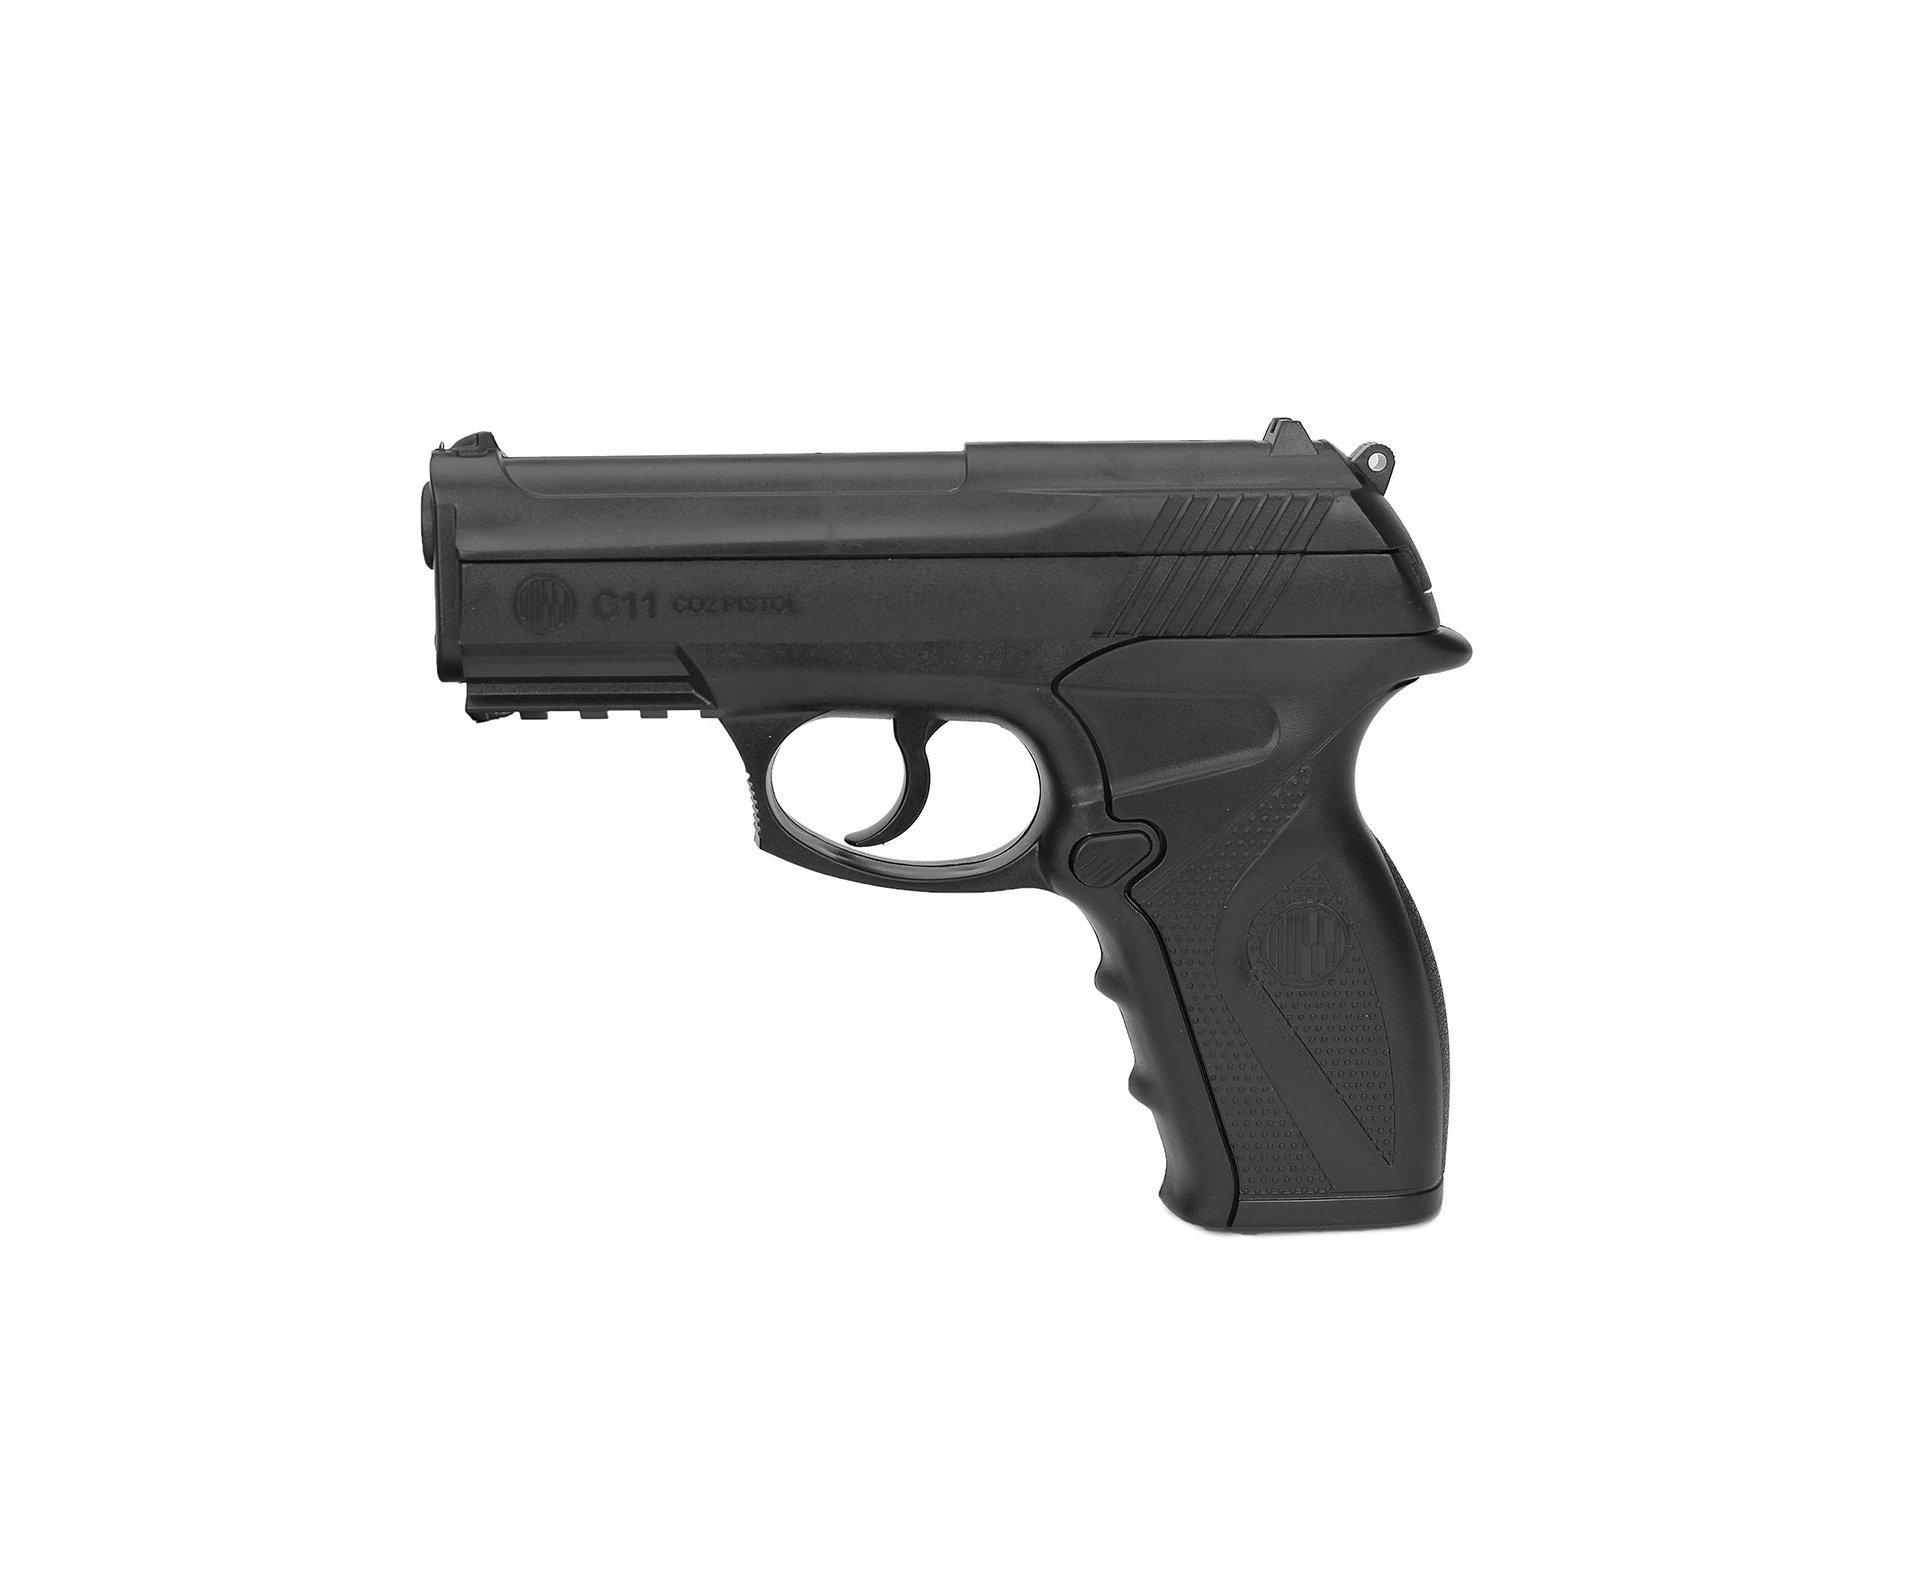 Pistola De Pressão Gas Co2 Wg C11 Polímero Esferas Aço 4,5mm